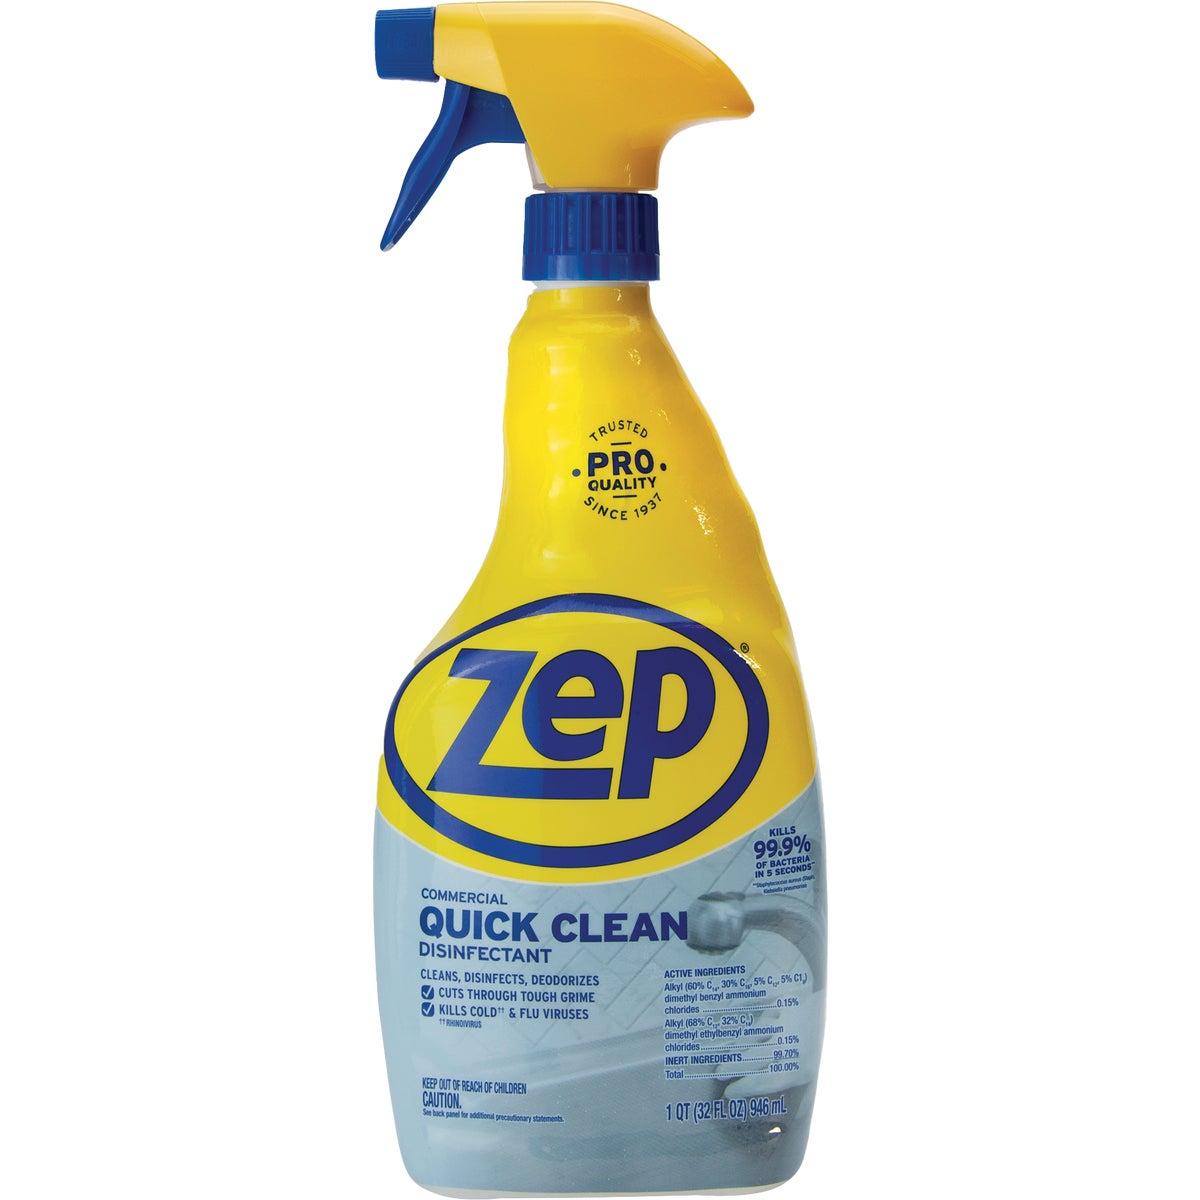 32OZ QUICK CLEAN DISINF